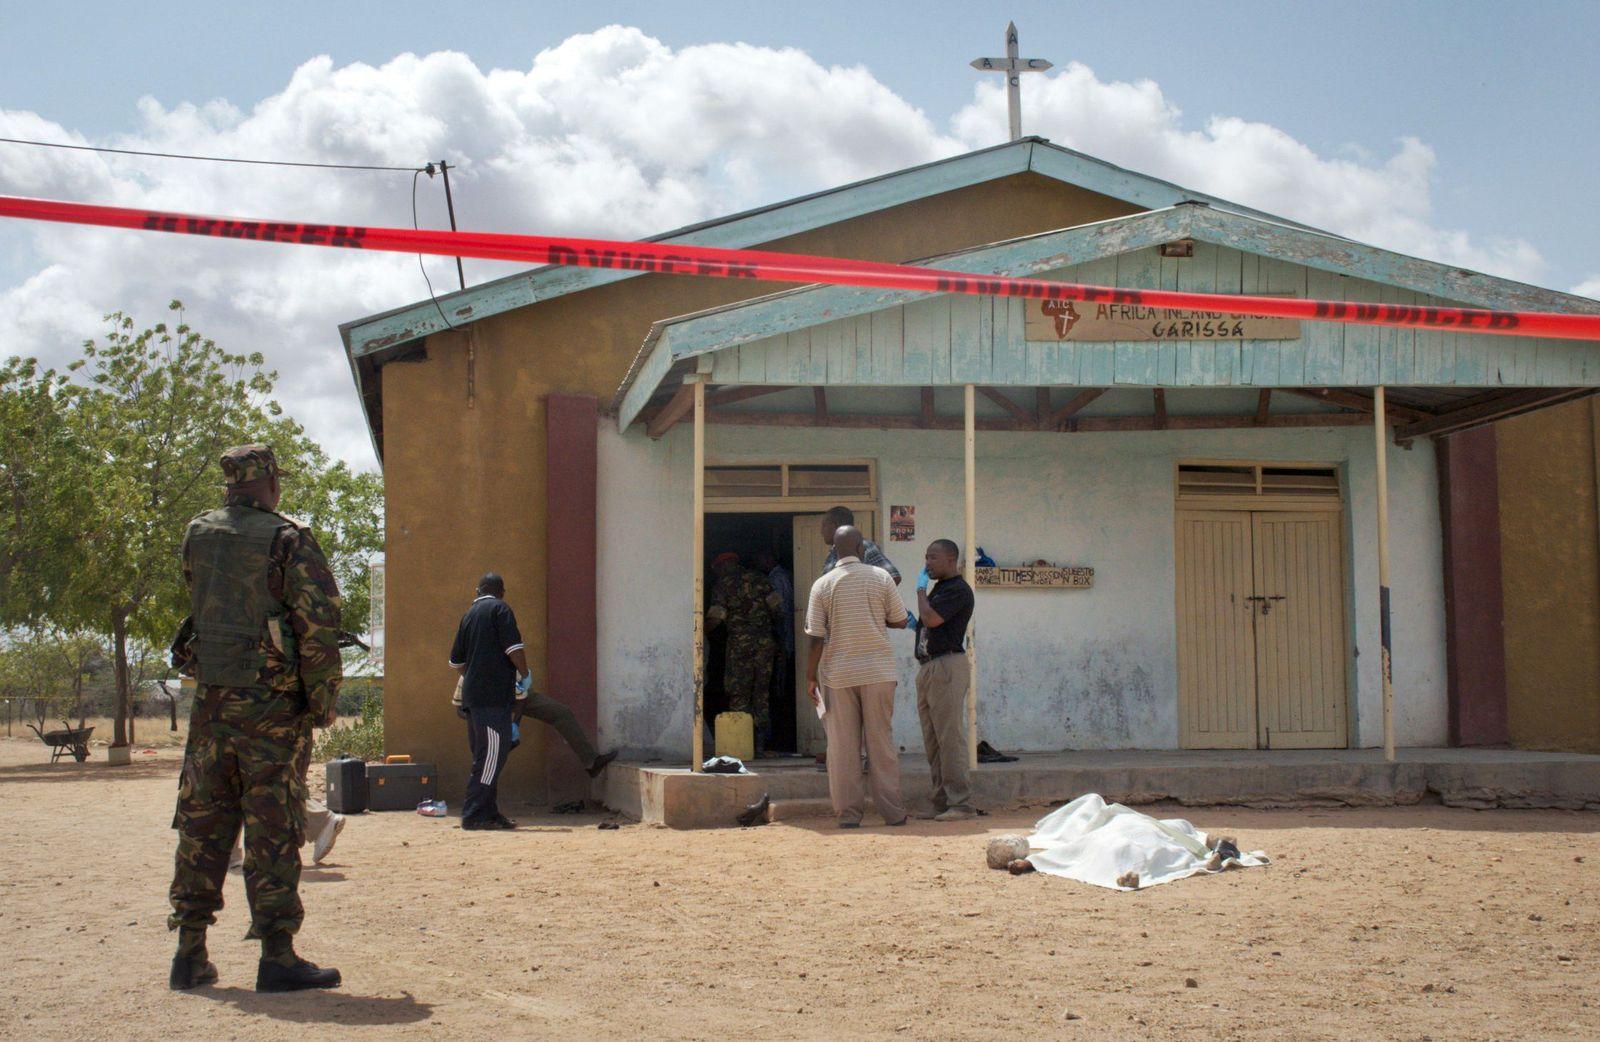 Kenia/ Kirche/ Anschlag